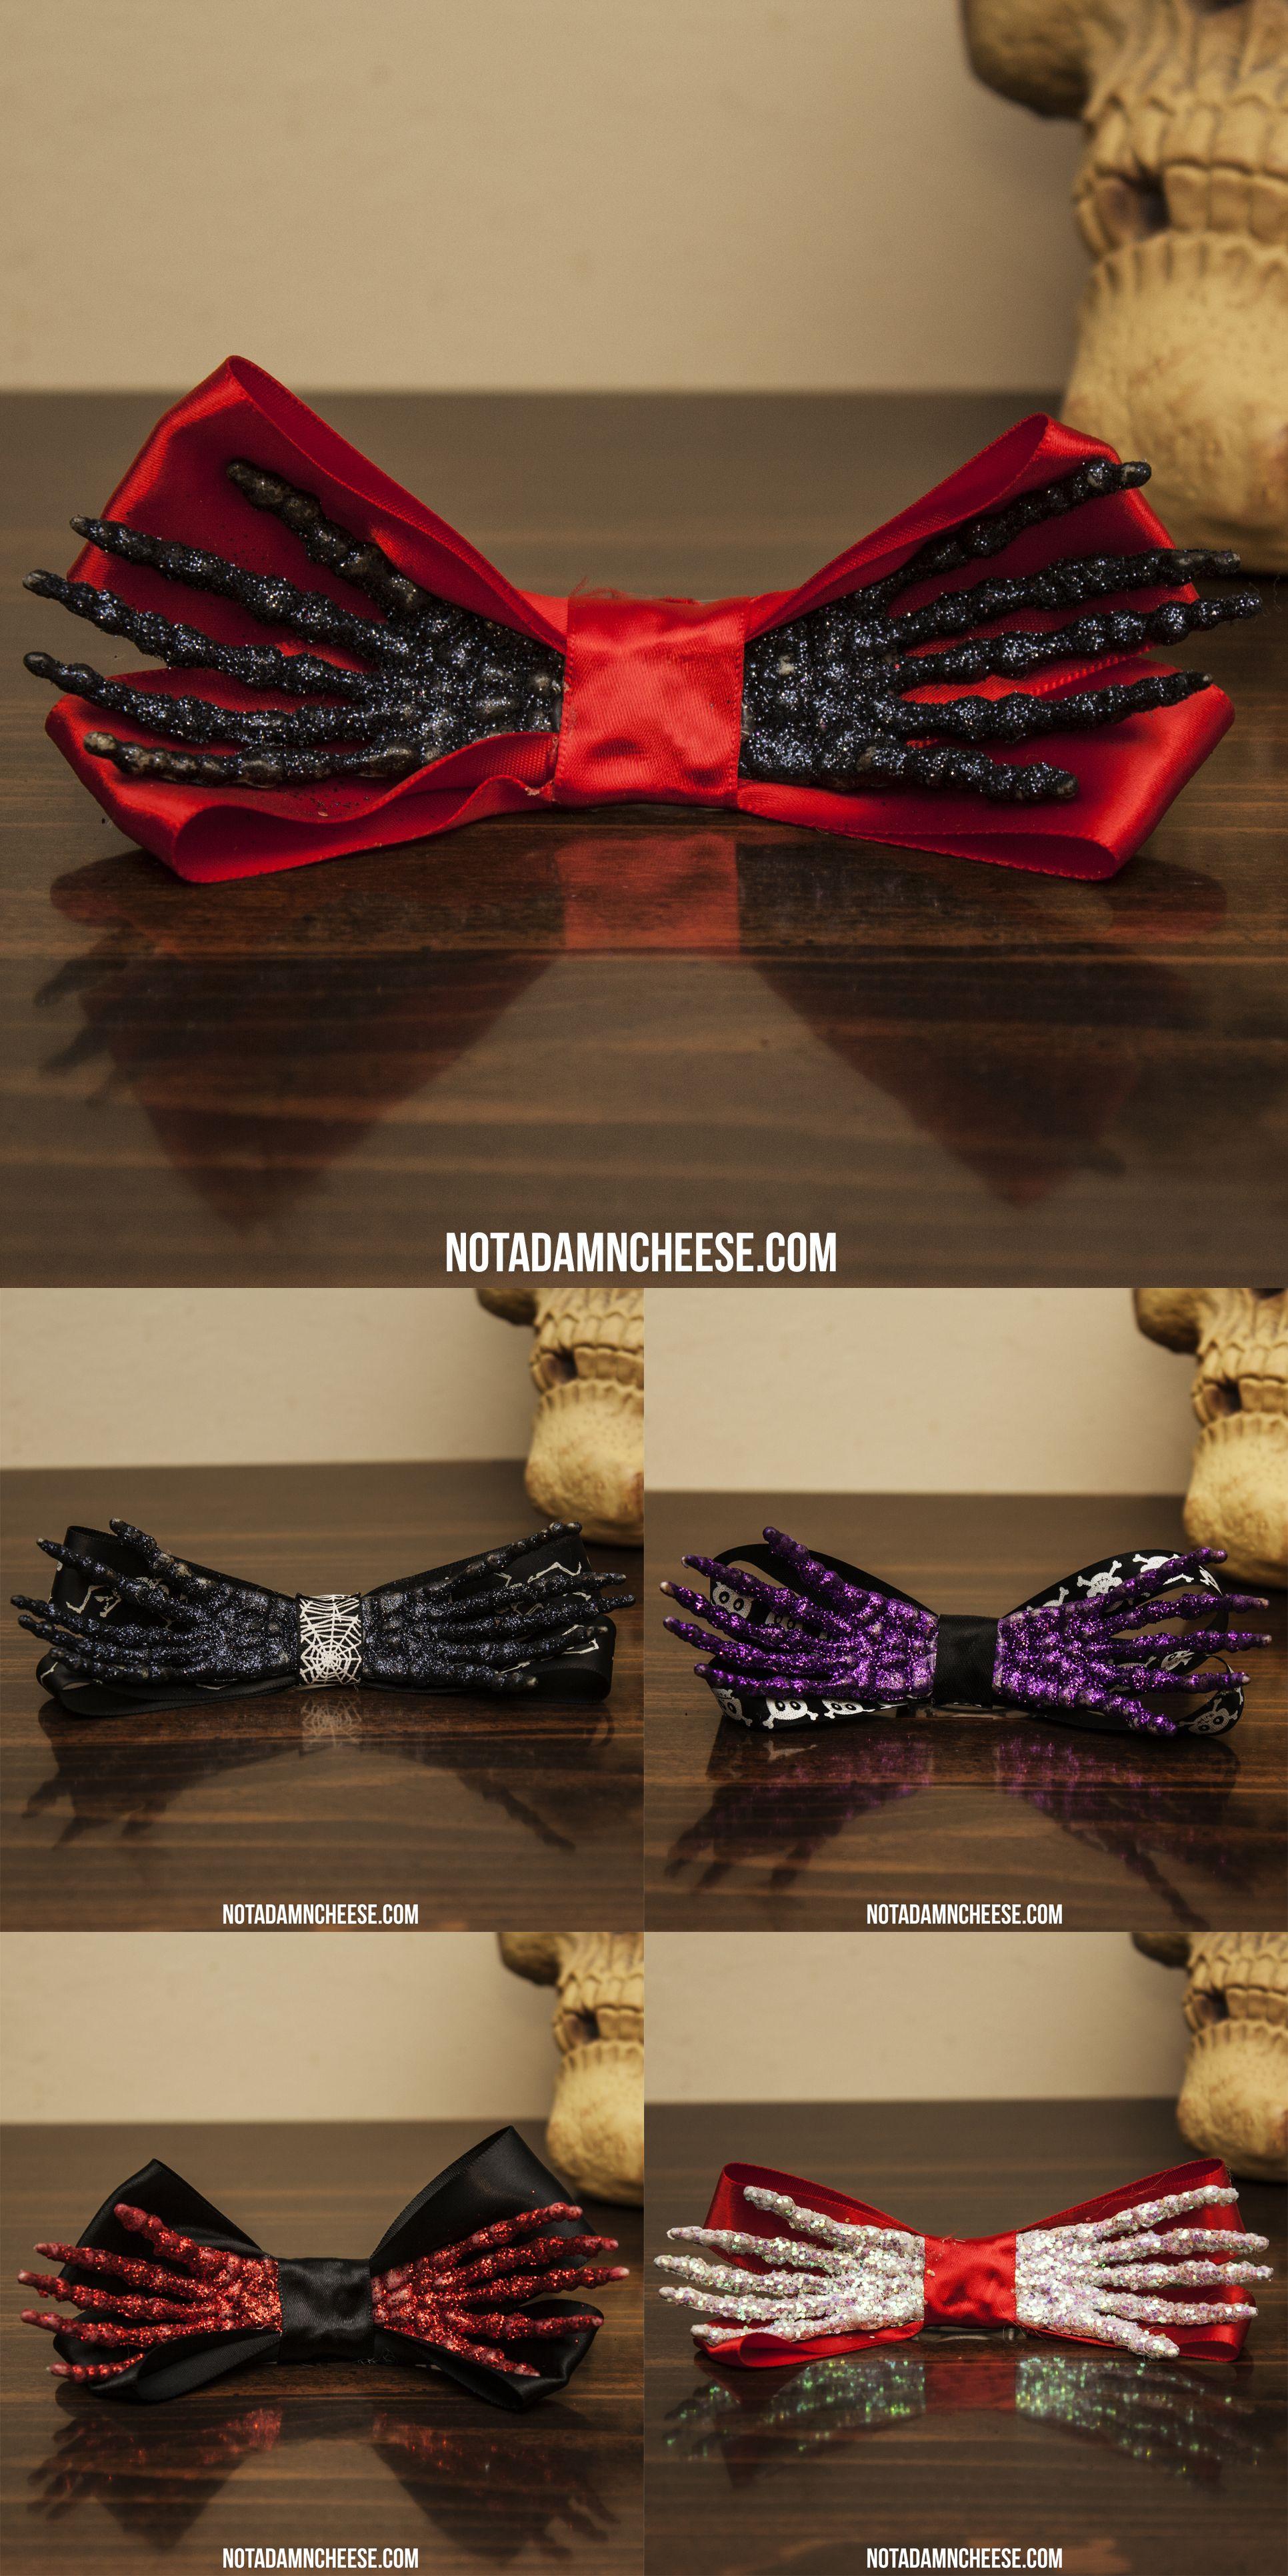 Handmade skeleton hand hair bows! Available for sale at NotADamnCheese.com !  #halloween #goth #craft #art #artsandcrafts #skeleton #hand #bones #creepy #spooky #cute #hair #bow #glitter #black